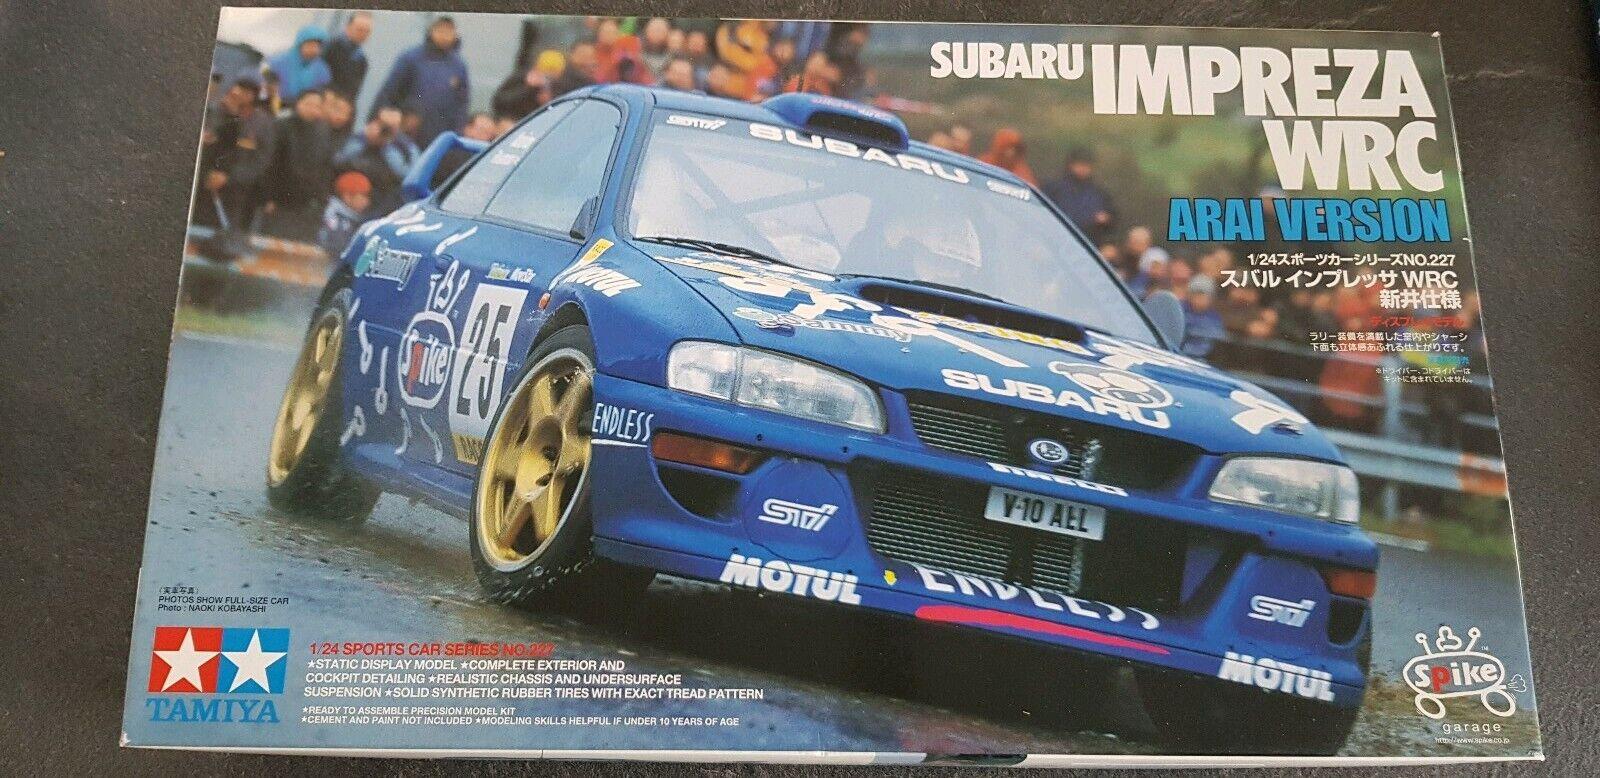 1 24 Tamiya Subaru Impreza WRC Arai Version Rare Kit  24227